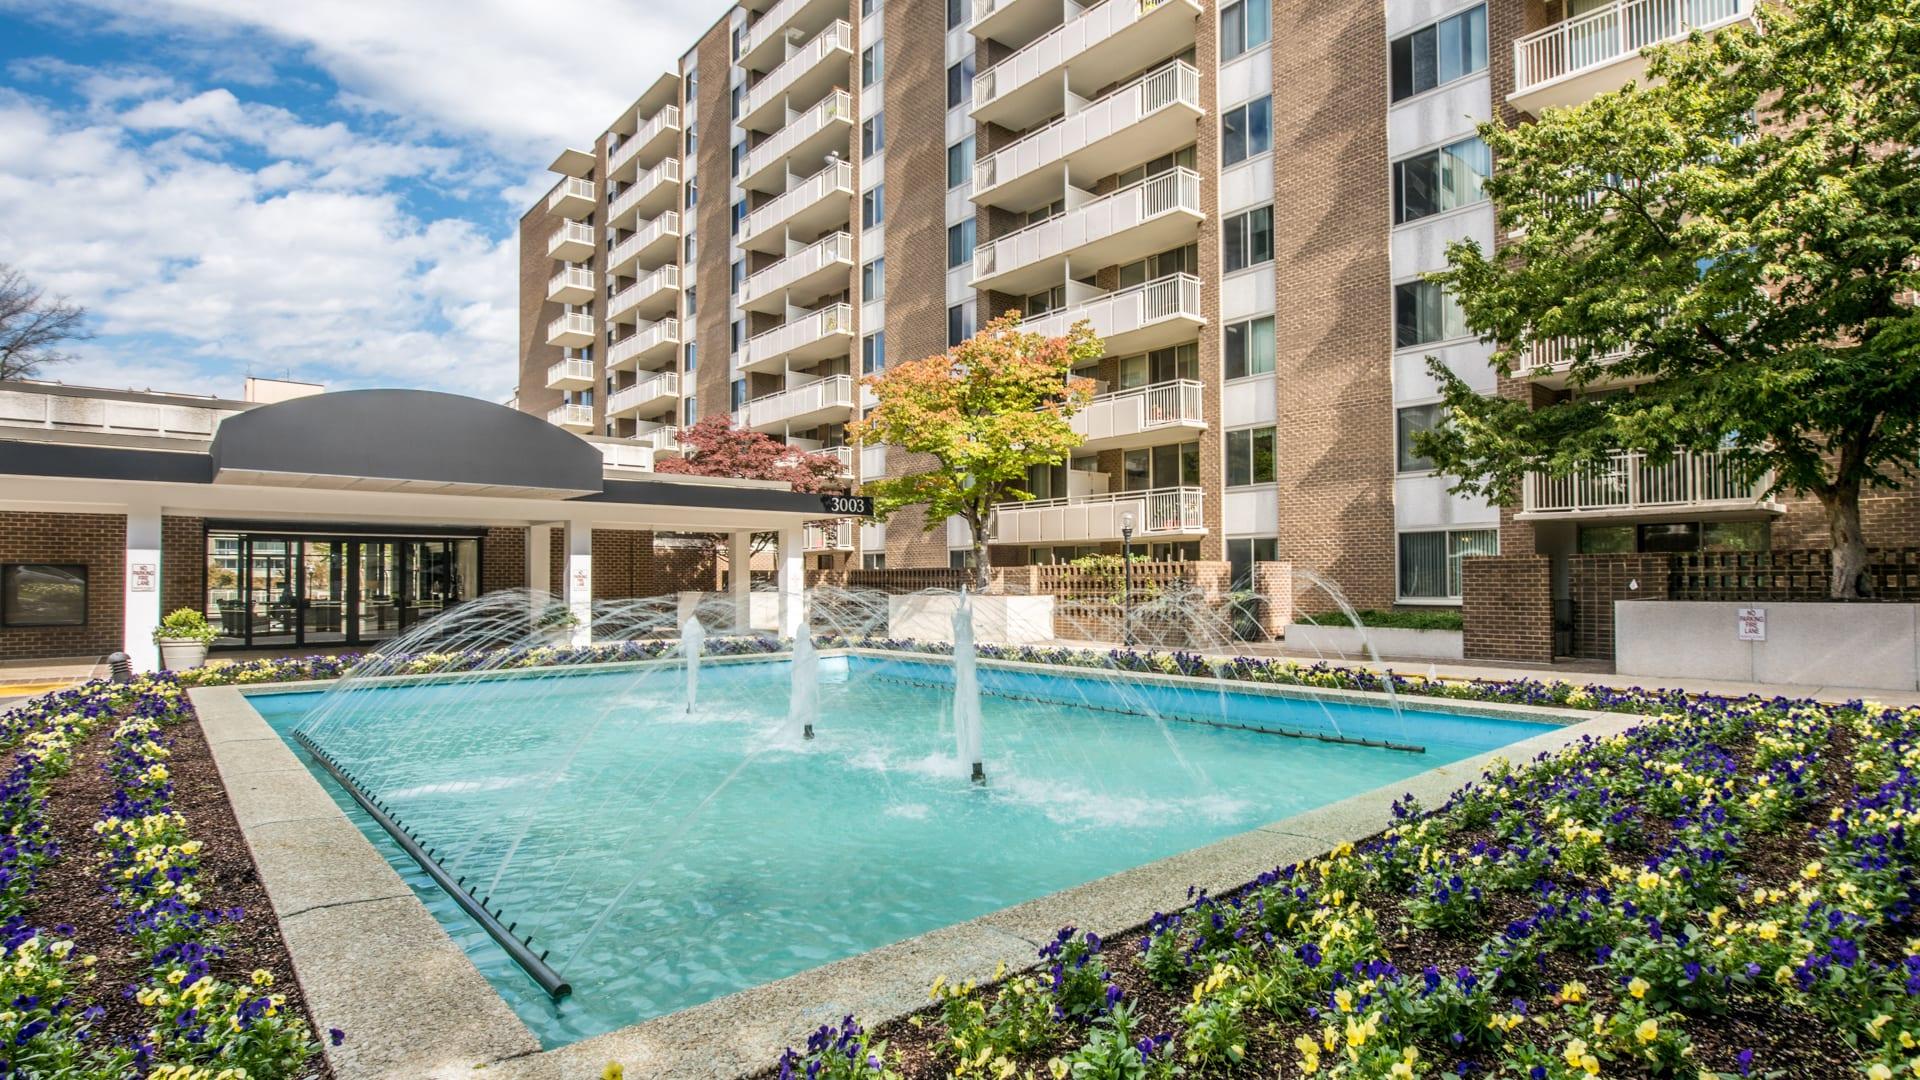 3003 Van Ness Apartments - Courtyard